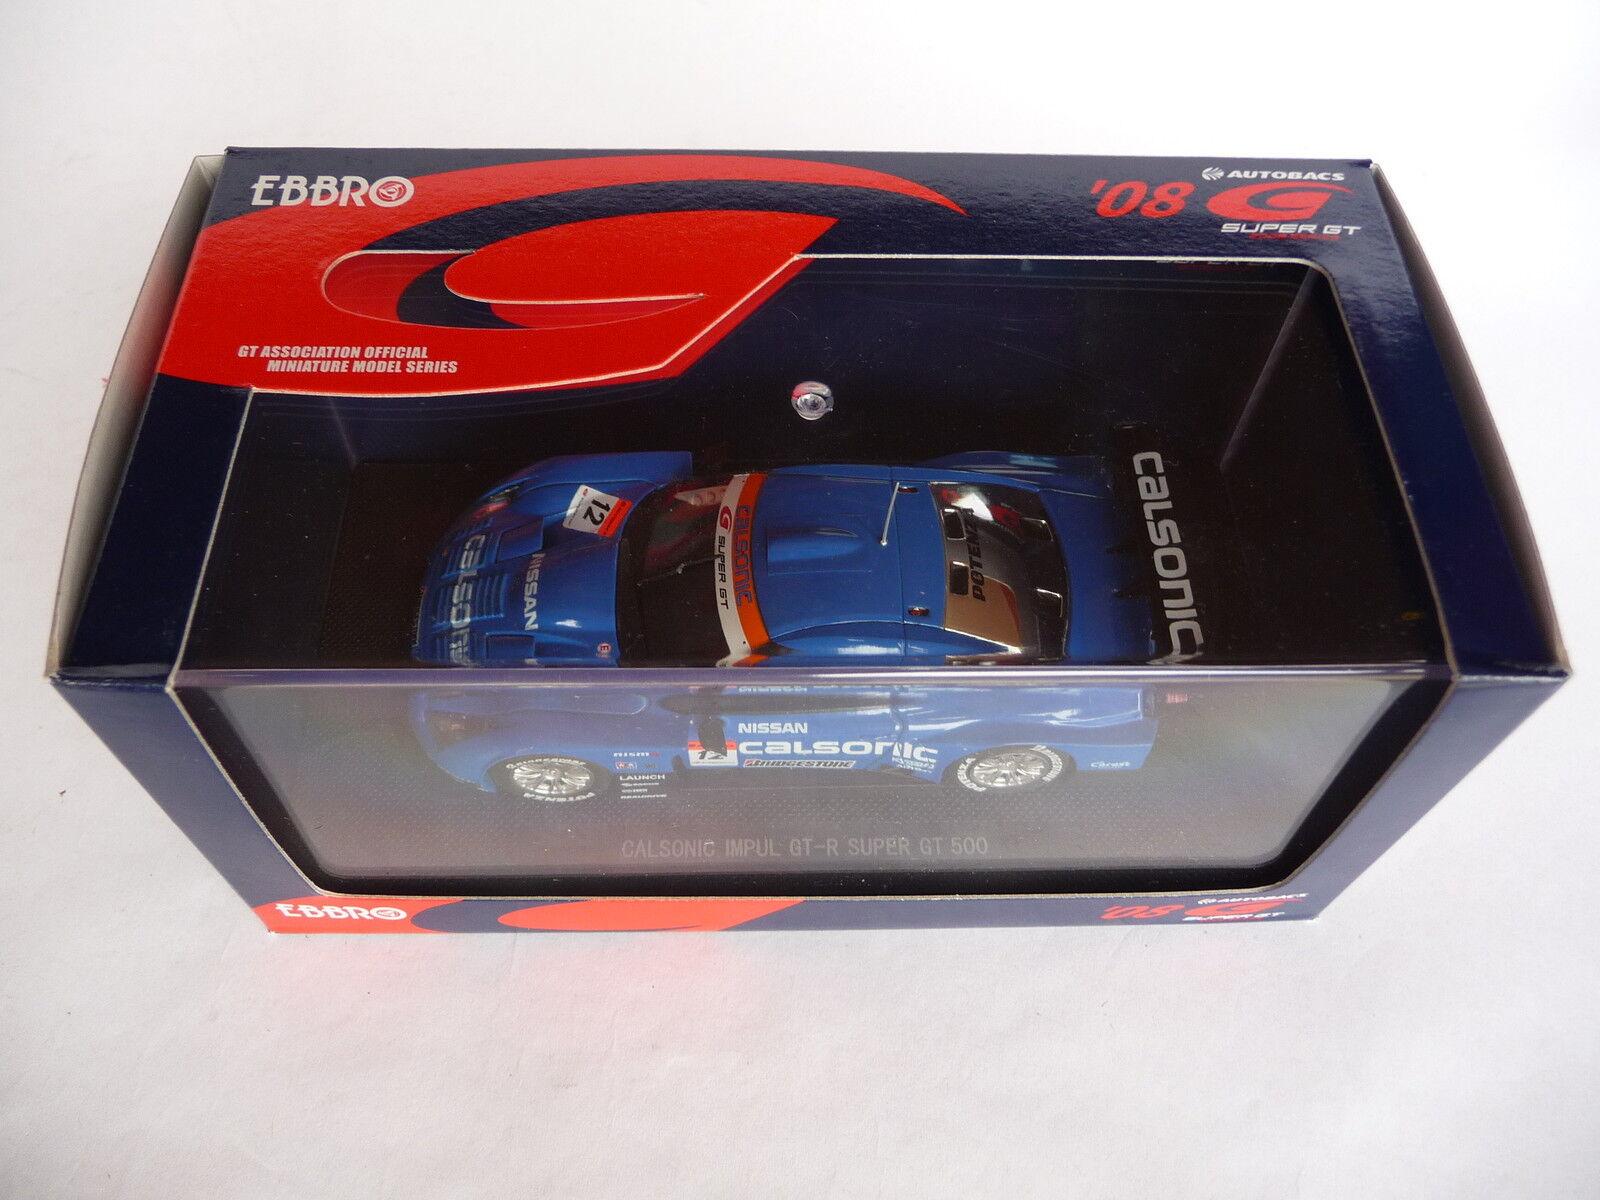 Ebbro 1 43 Nissan Calsonic Impul GT-R SGT 2008 EB44045